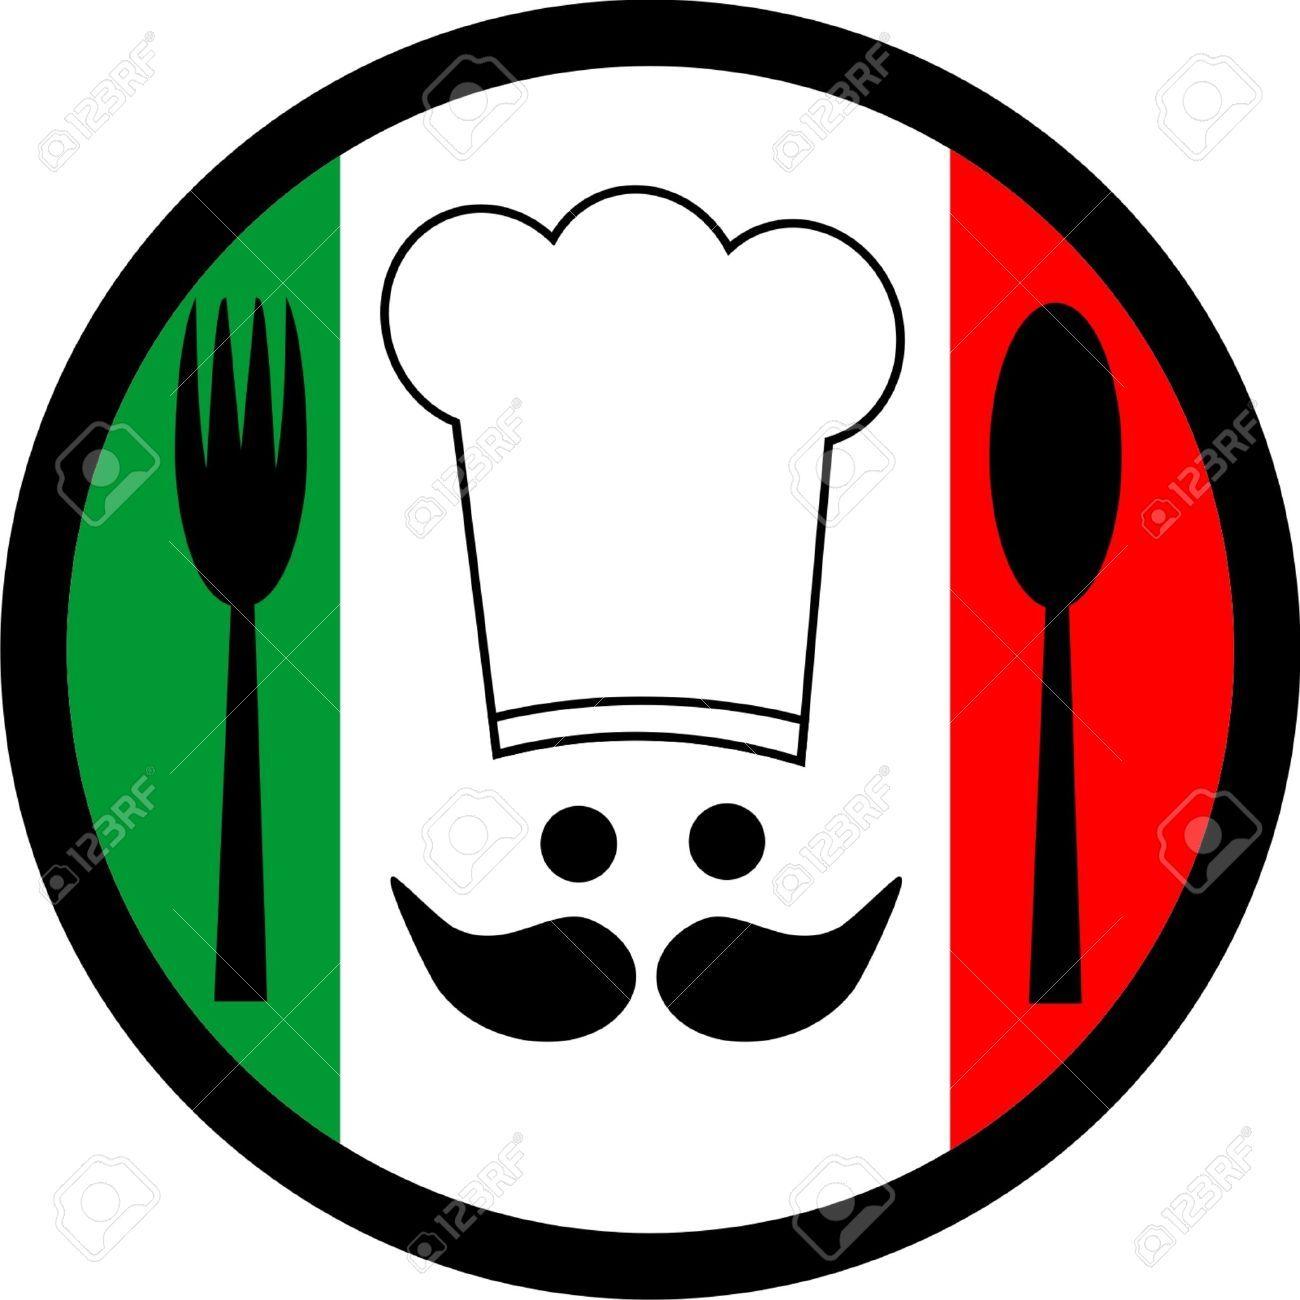 Italian food free clipart image library stock Italian food clipart free 6 » Clipart Portal image library stock